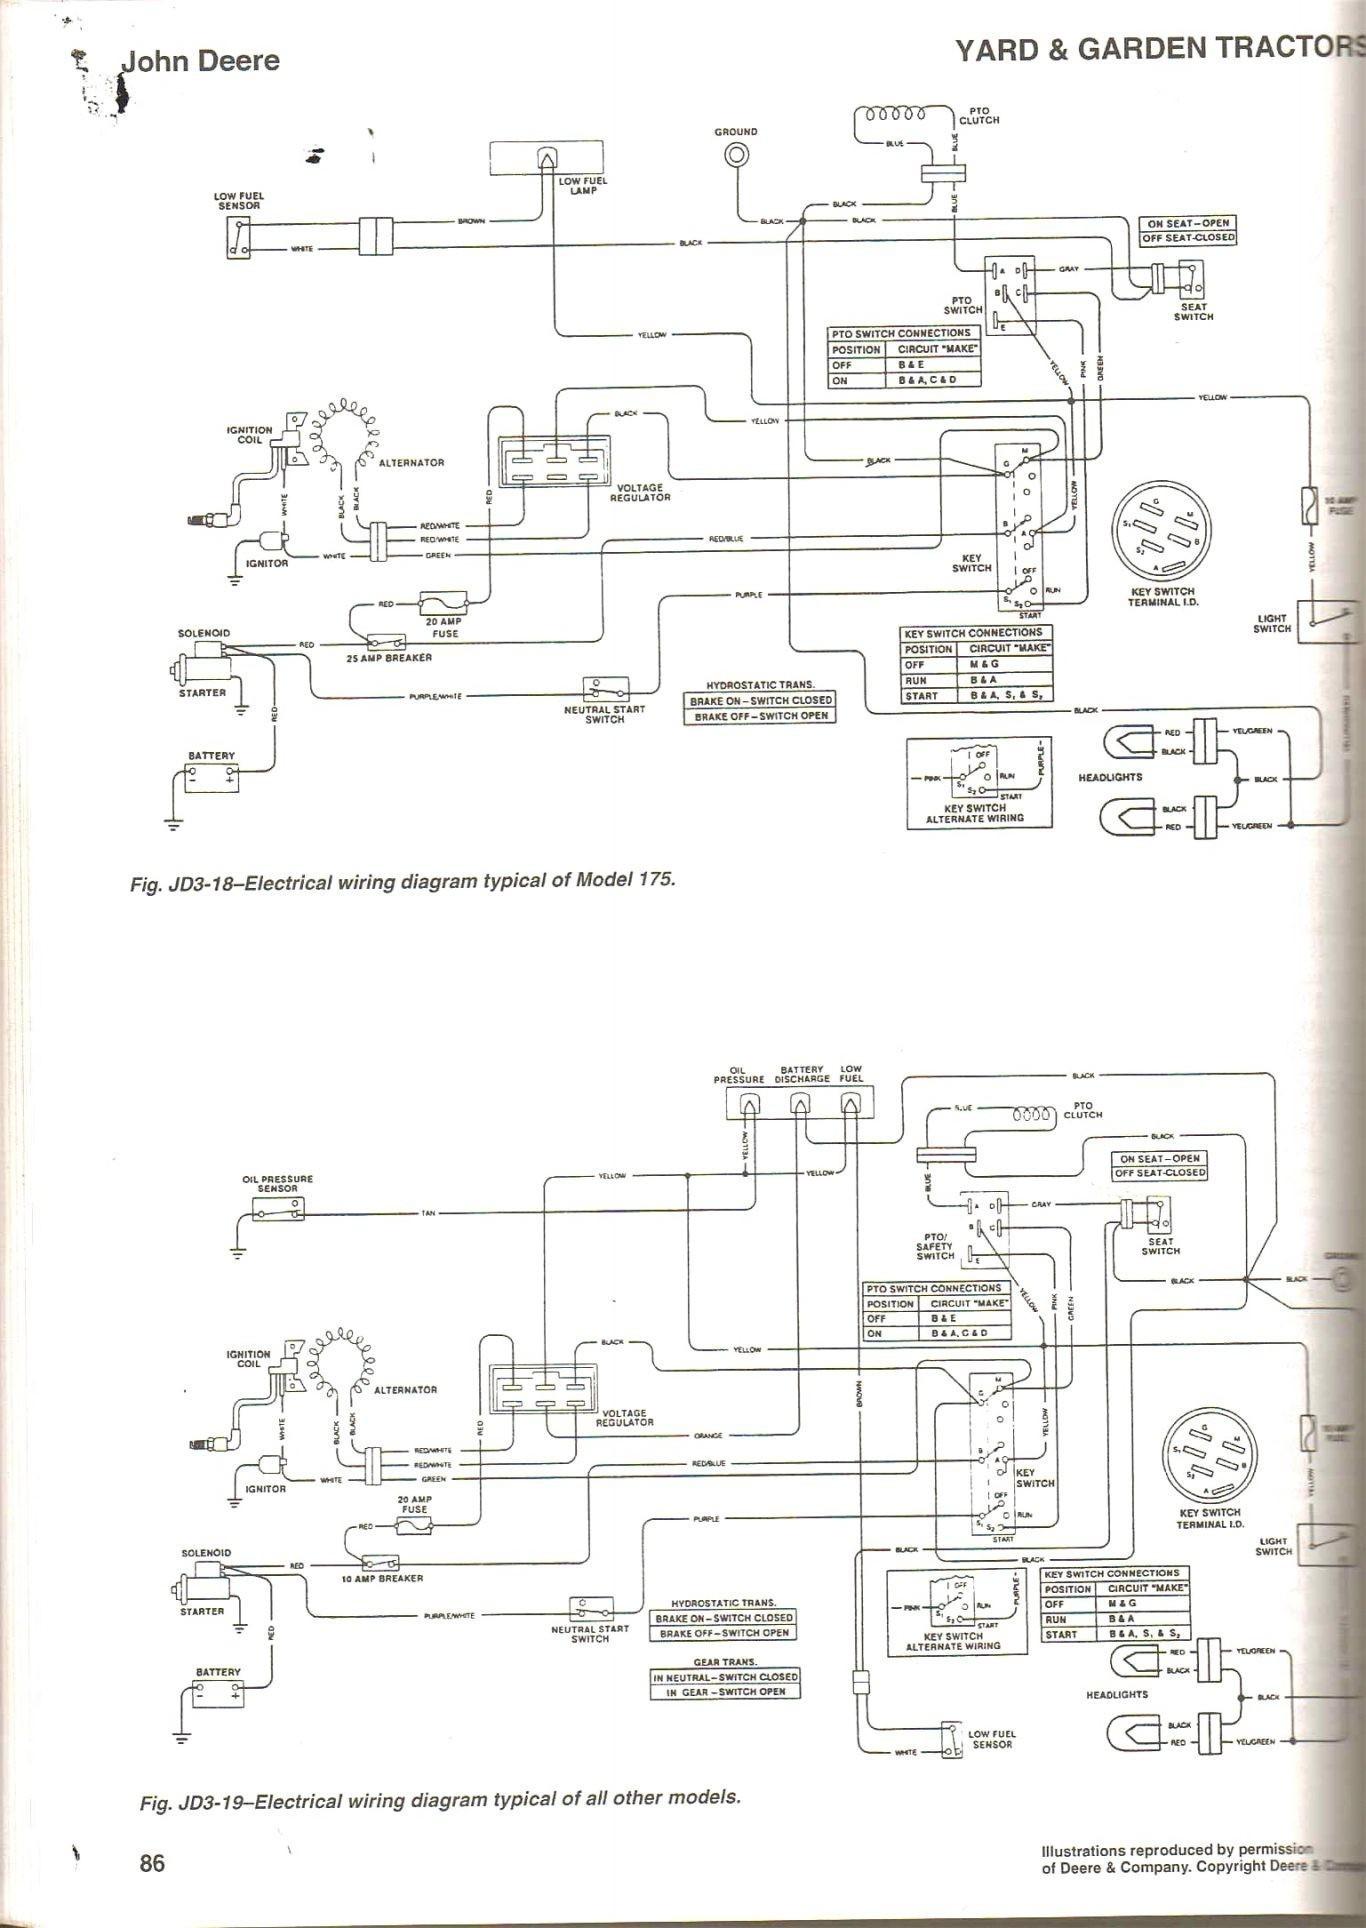 2008 Dodge Ram Trailer Wiring - Explained Wiring Diagrams on dodge w150 wiring diagram, dodge ram trailer wiring diagram, dodge pickup wiring diagram, mercury milan wiring diagram, chevrolet volt wiring diagram, ford f-250 super duty wiring diagram, dodge sprinter wiring diagram, 1987 dodge ram 50 wiring diagram, dodge d150 wiring diagram, dodge headlight wiring diagram, dodge 47re transmission wiring diagram, 2001 dodge ram electrical diagram, dodge ram light wiring diagram, dodge wire harness diagram, 2012 ram 3500 wiring diagram, dodge d250 wiring diagram, dodge challenger wiring diagram, 06 dodge ram wiring diagram, saturn aura wiring diagram, dodge d100 wiring diagram,